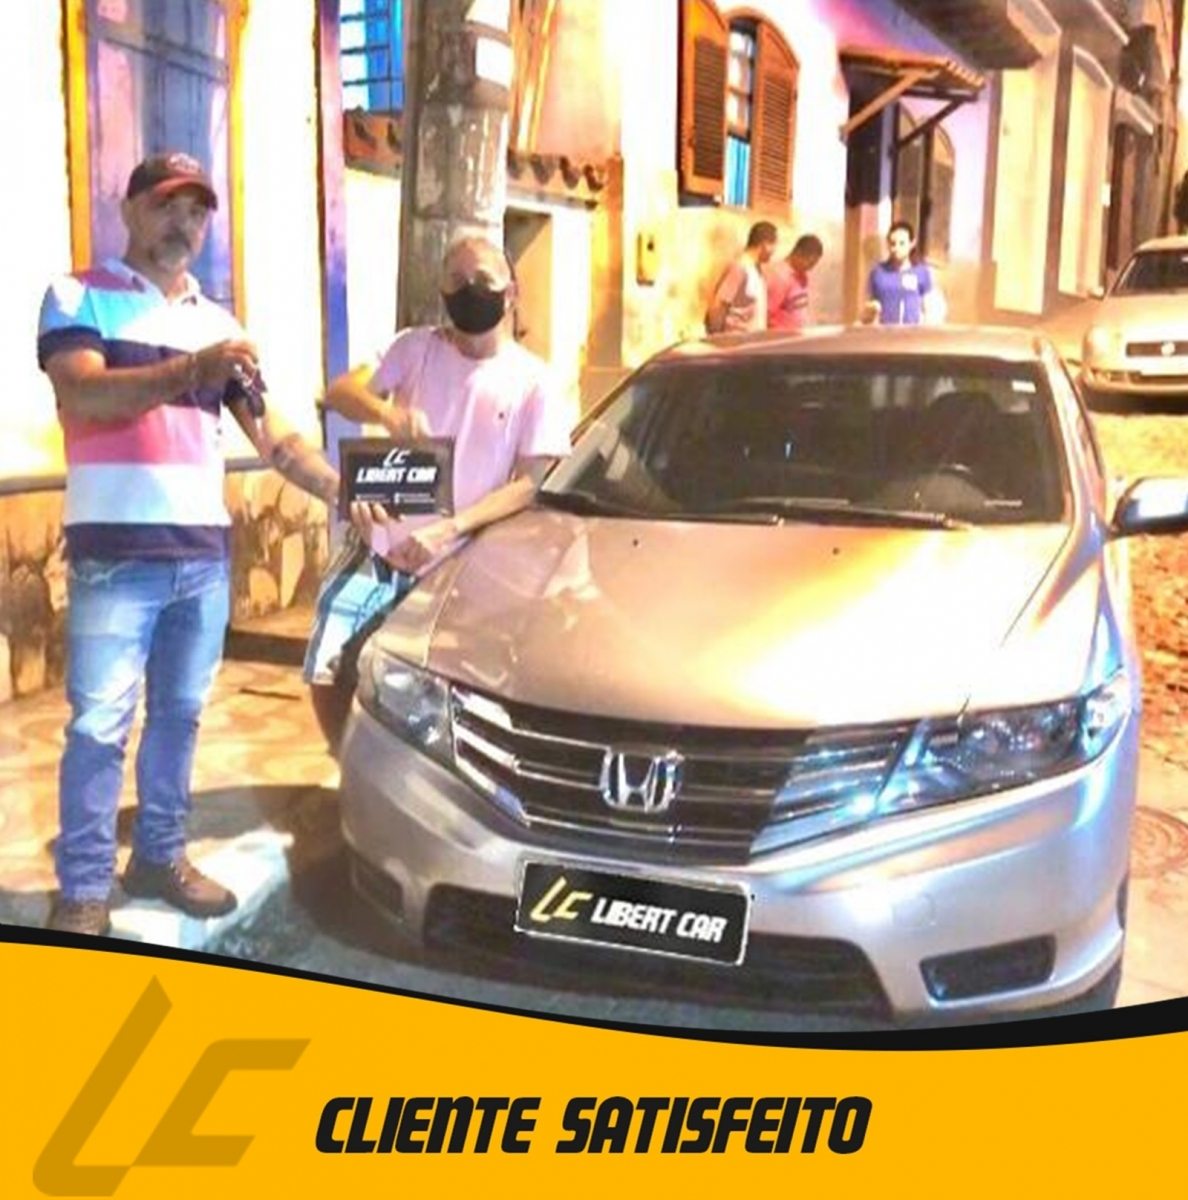 Cliente Satisfeito - José Dilson